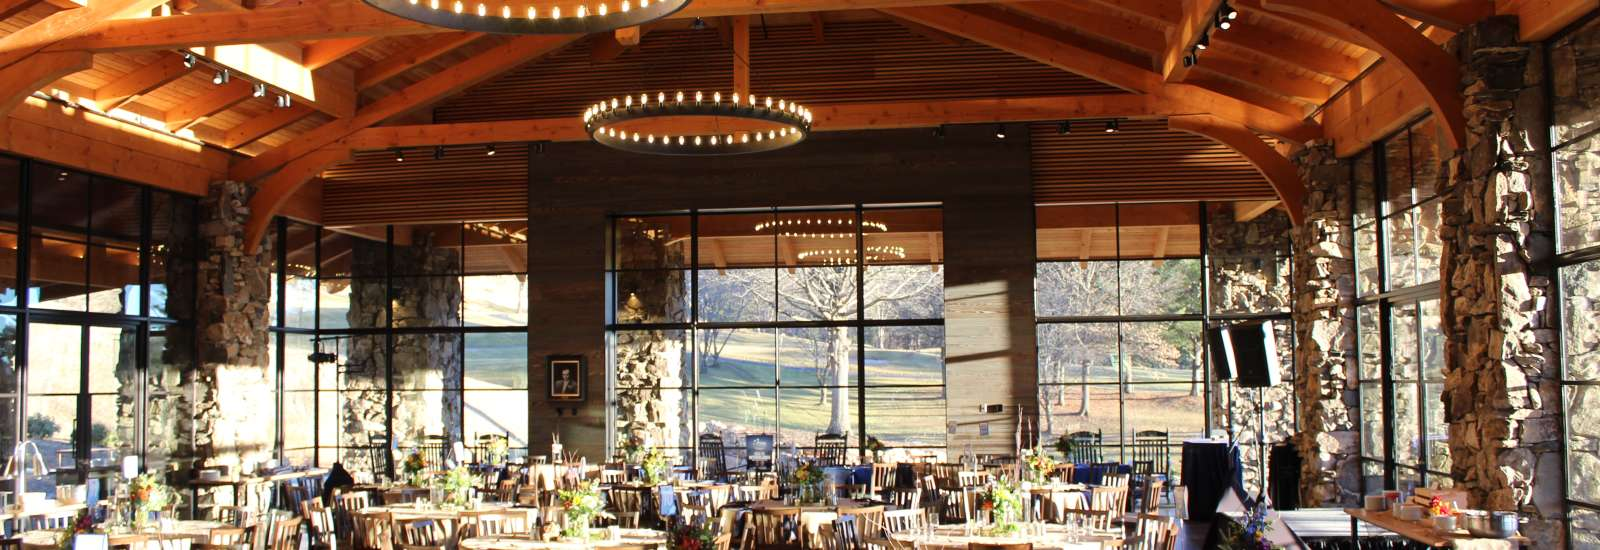 Omni Grove Park Inn Seely Pavilion